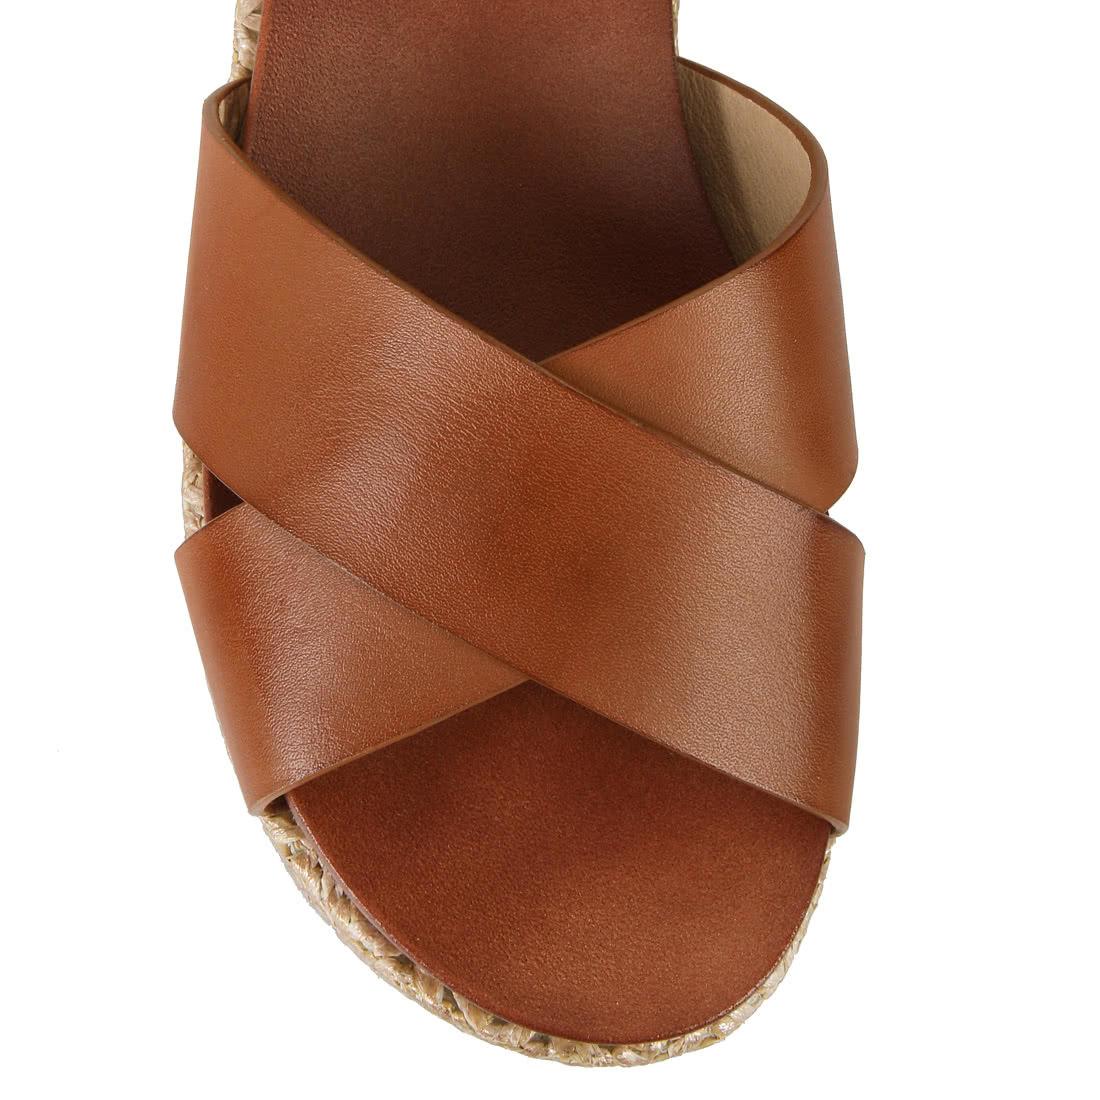 buffalo keil sandalette in cognac online kaufen buffalo. Black Bedroom Furniture Sets. Home Design Ideas